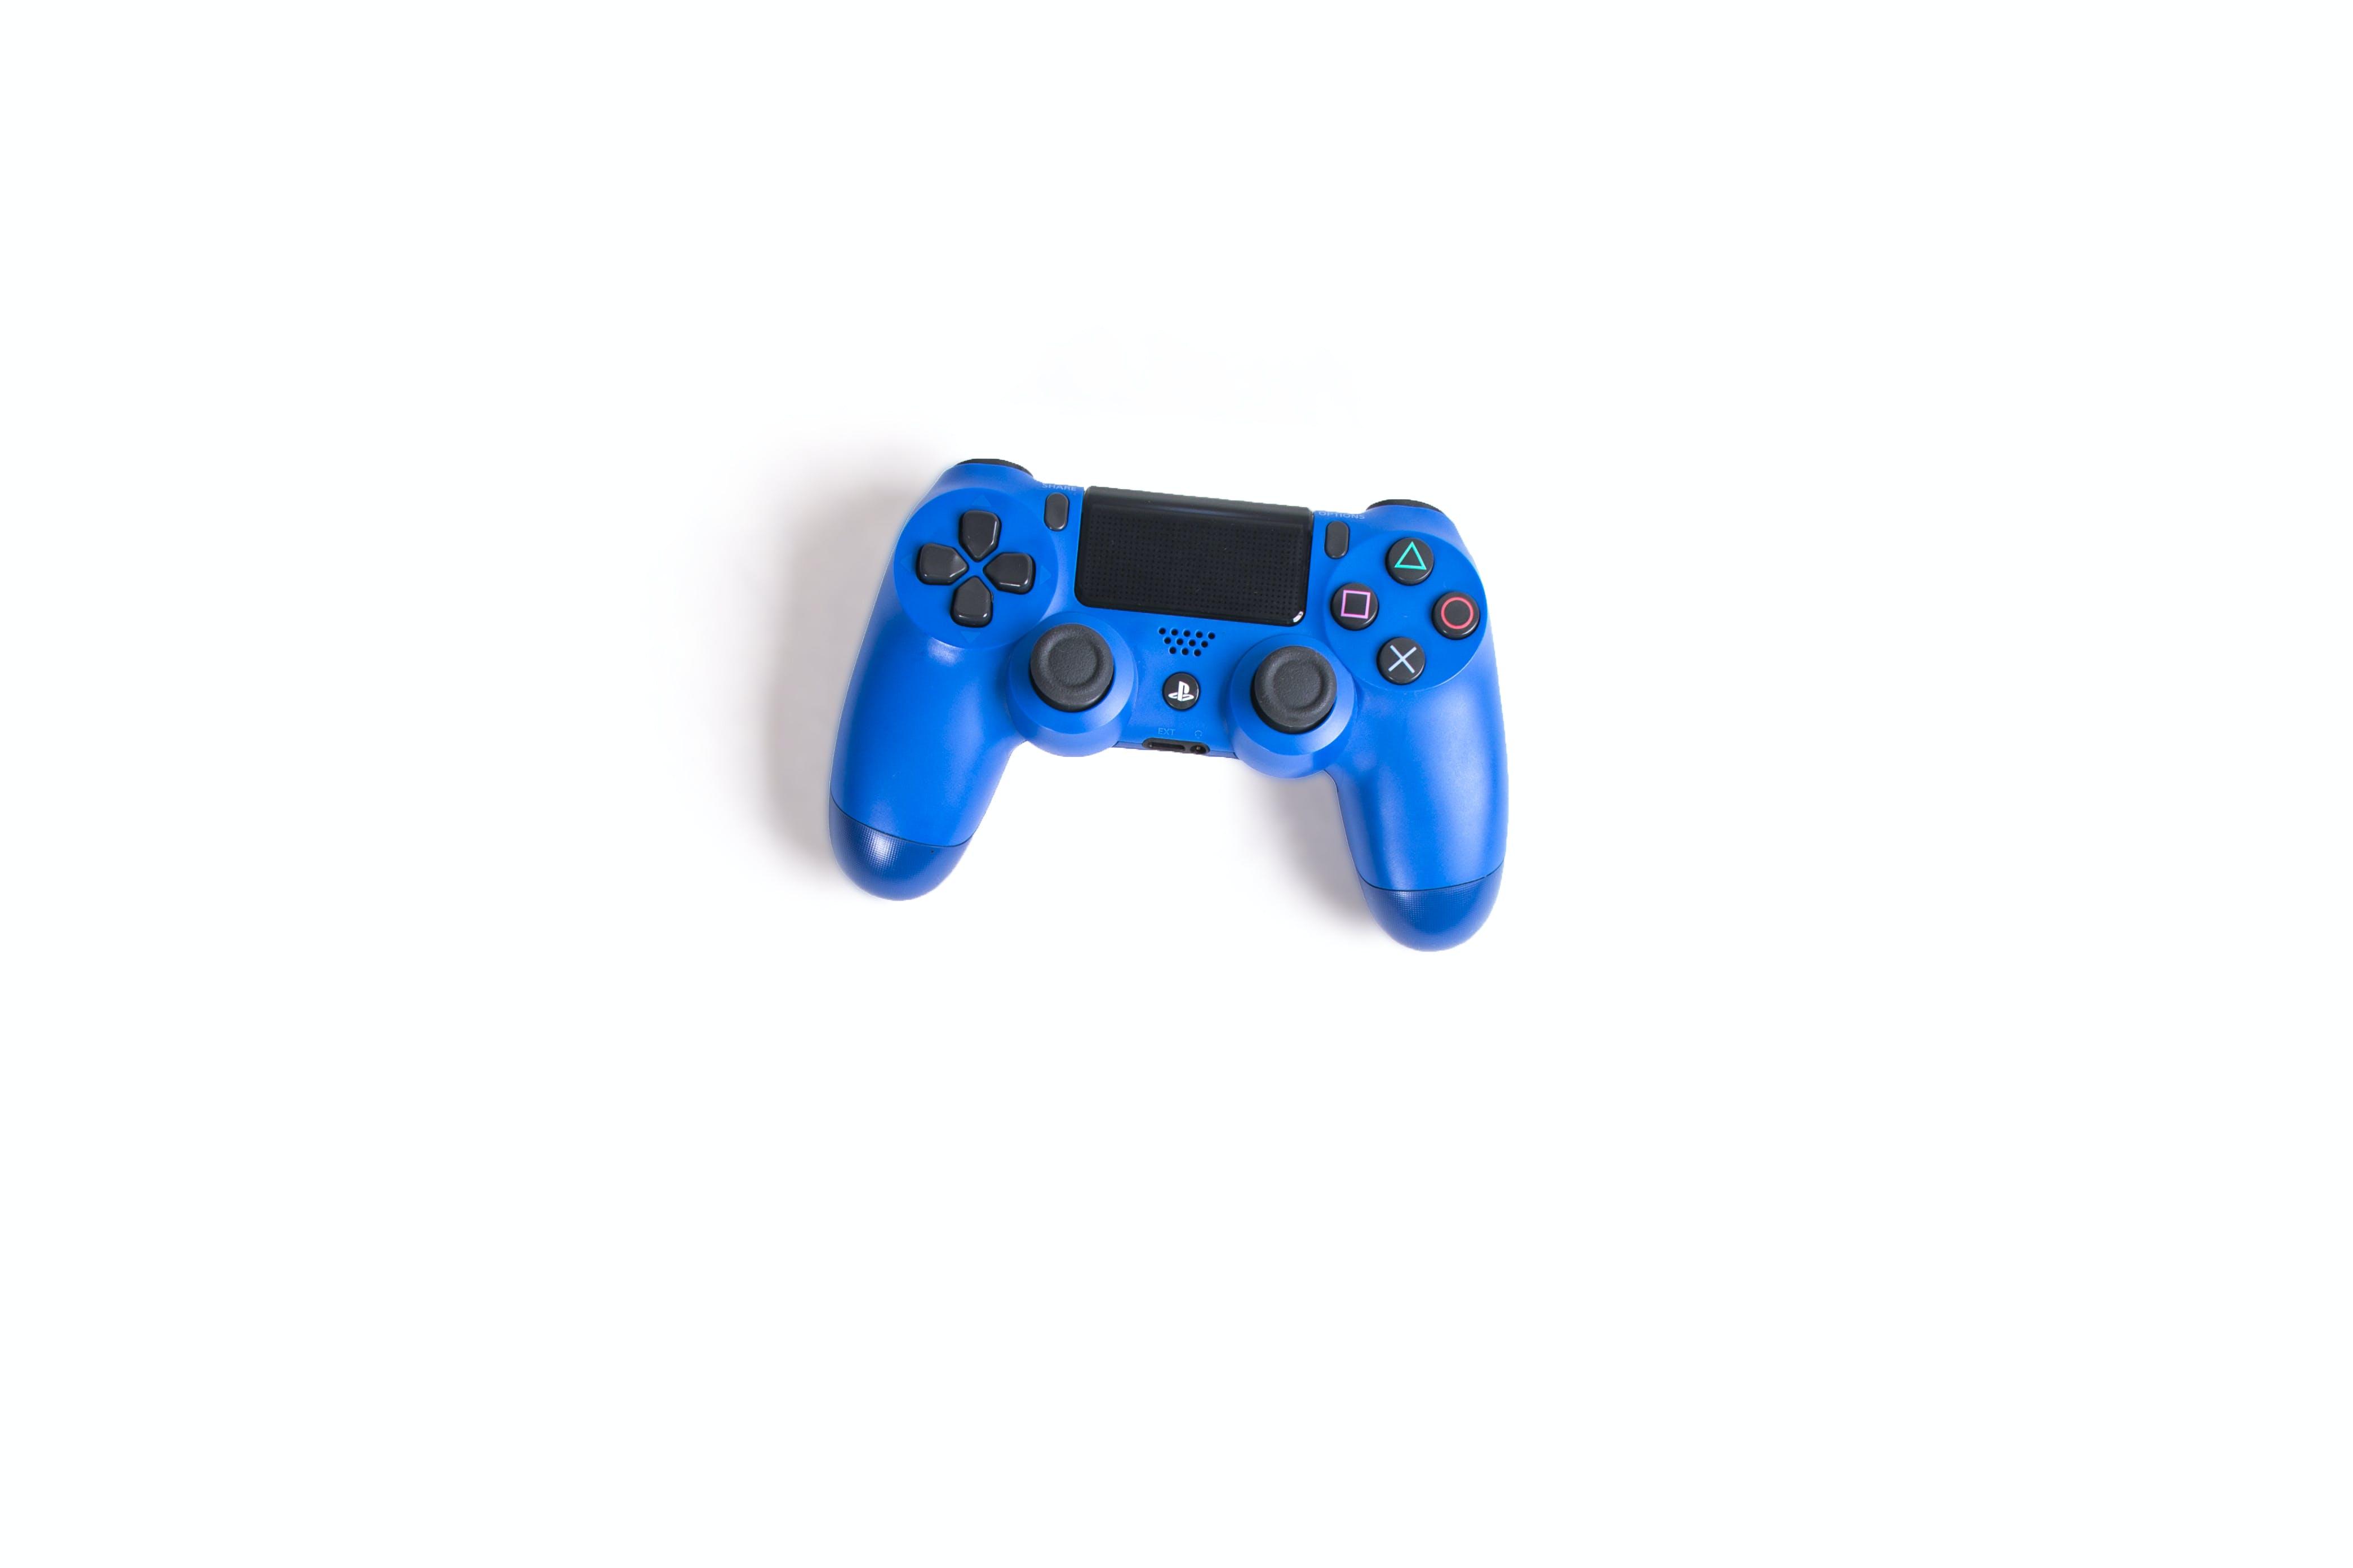 Blue Sony Dualshock 4 on White Surface